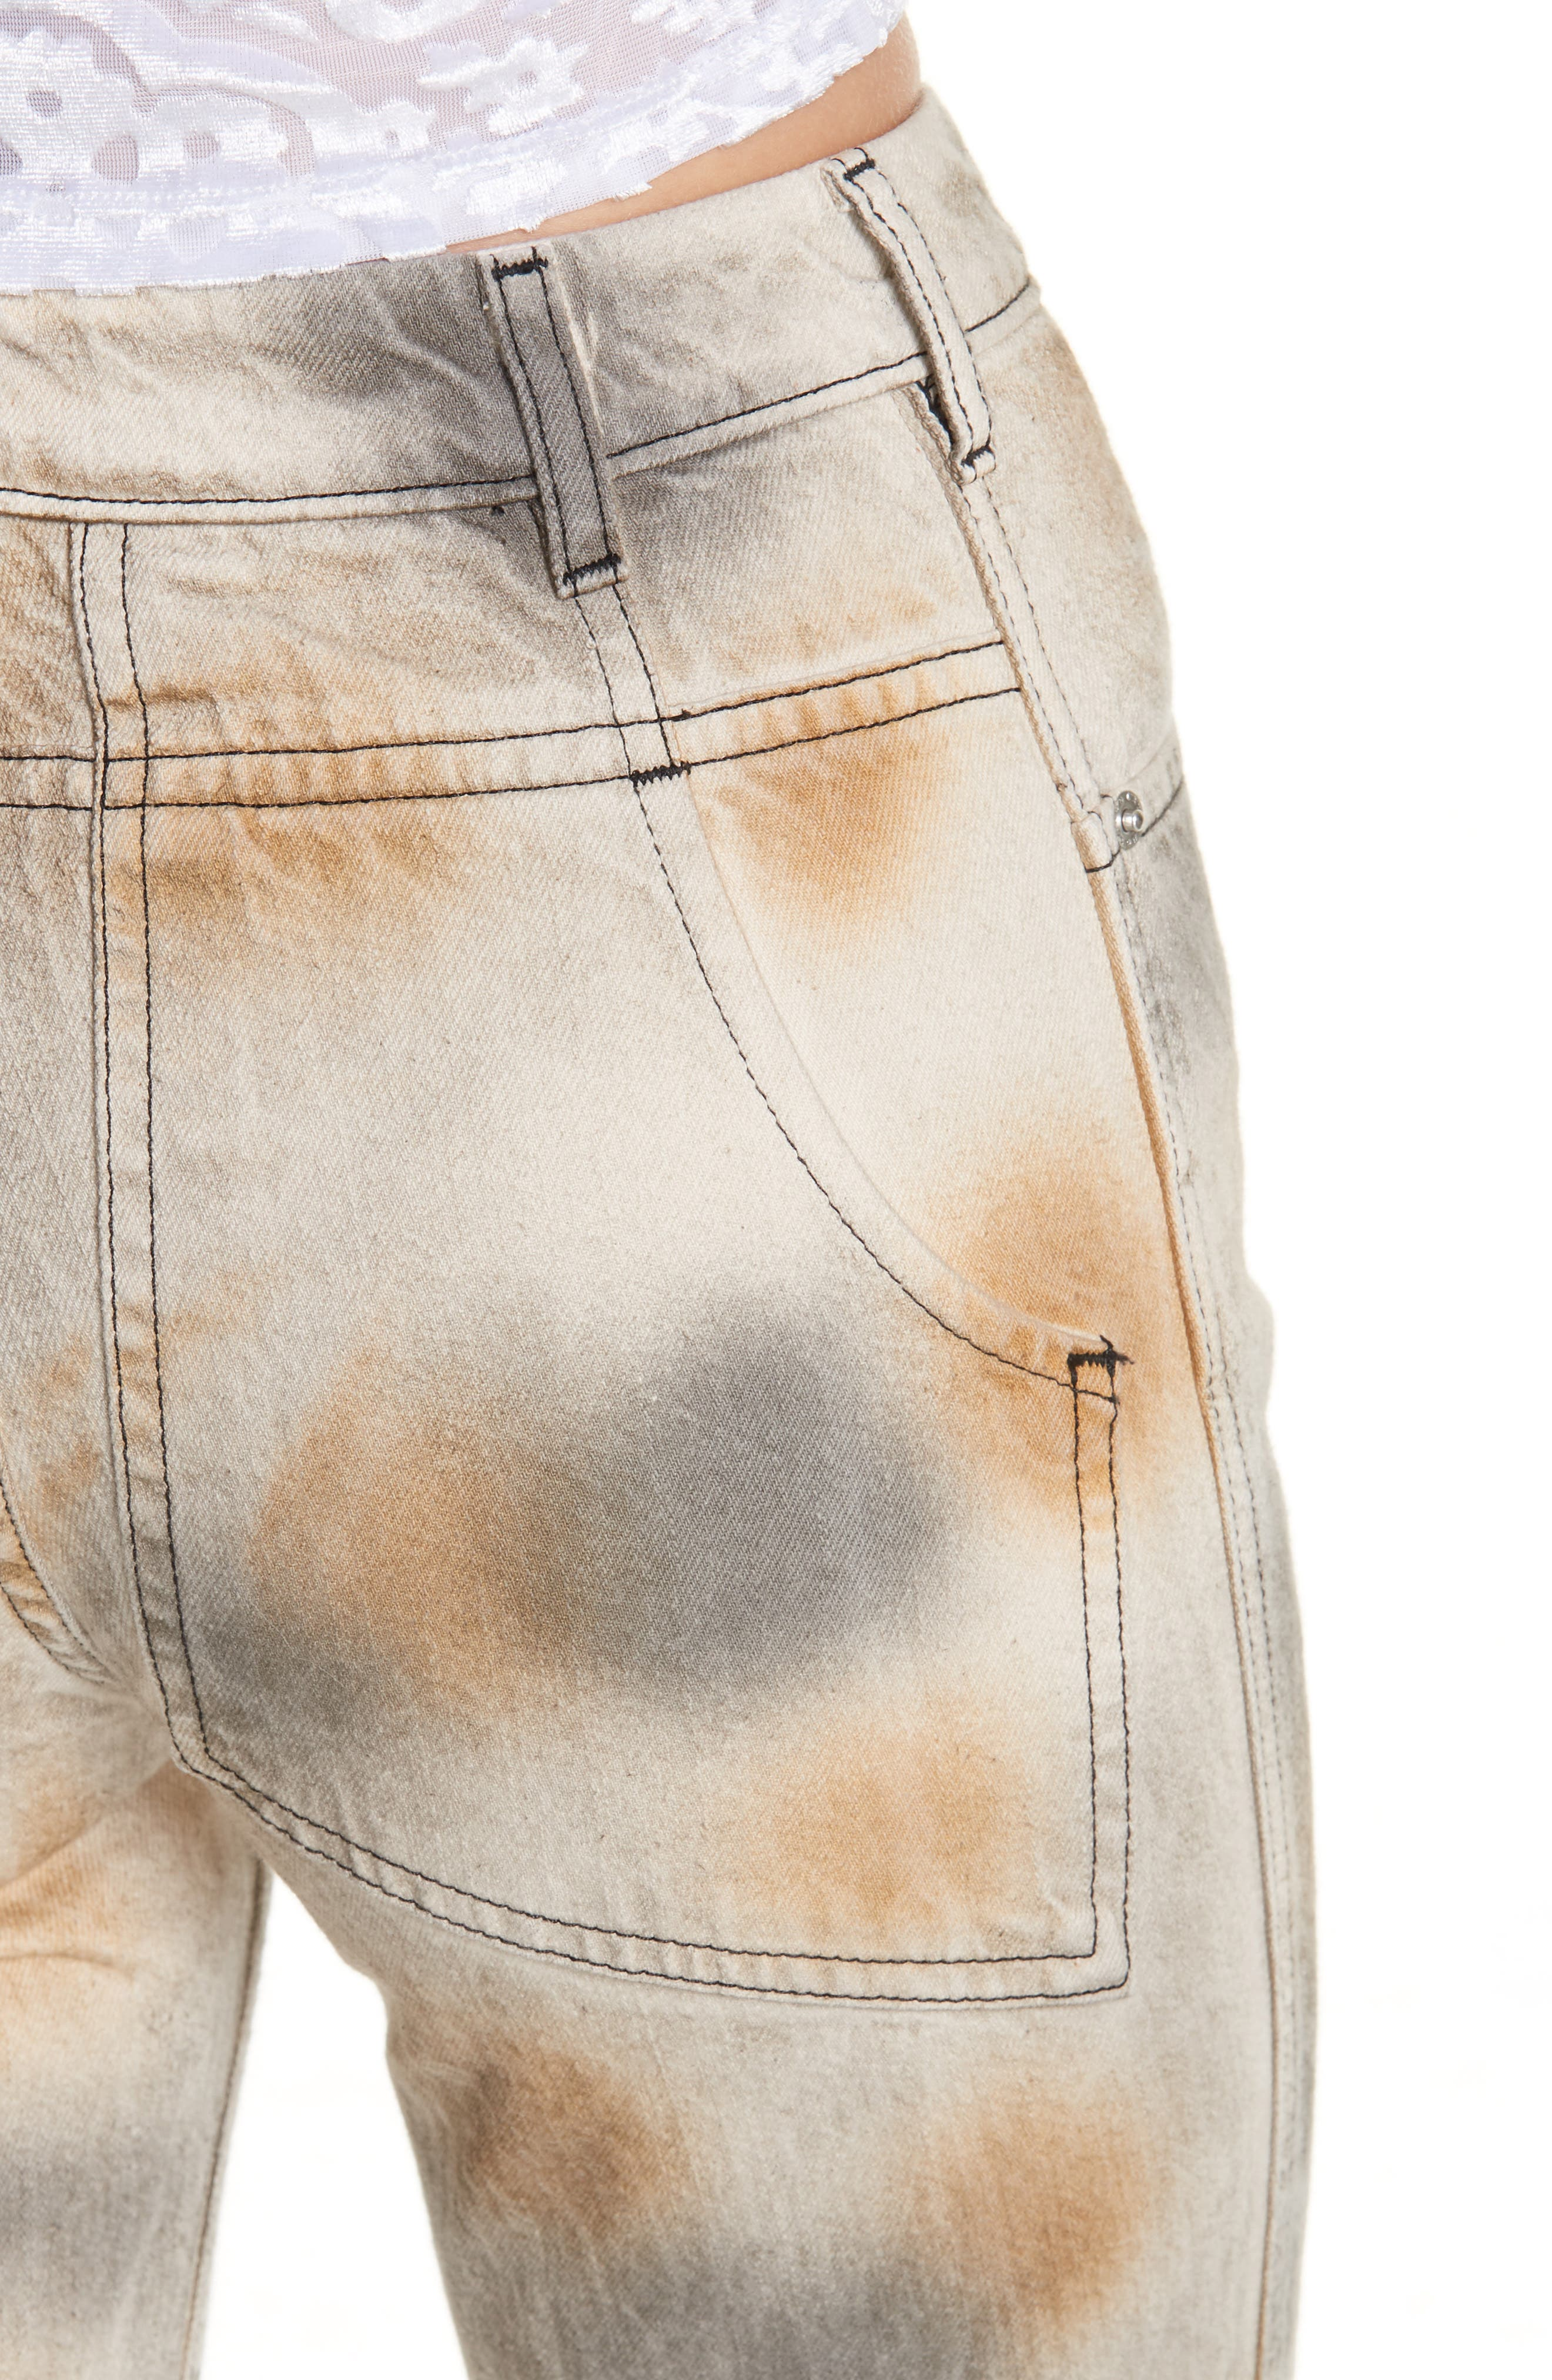 Echkaus Latta EL Tie Dye Straight Leg Jeans,                             Alternate thumbnail 4, color,                             DIRTY DYE